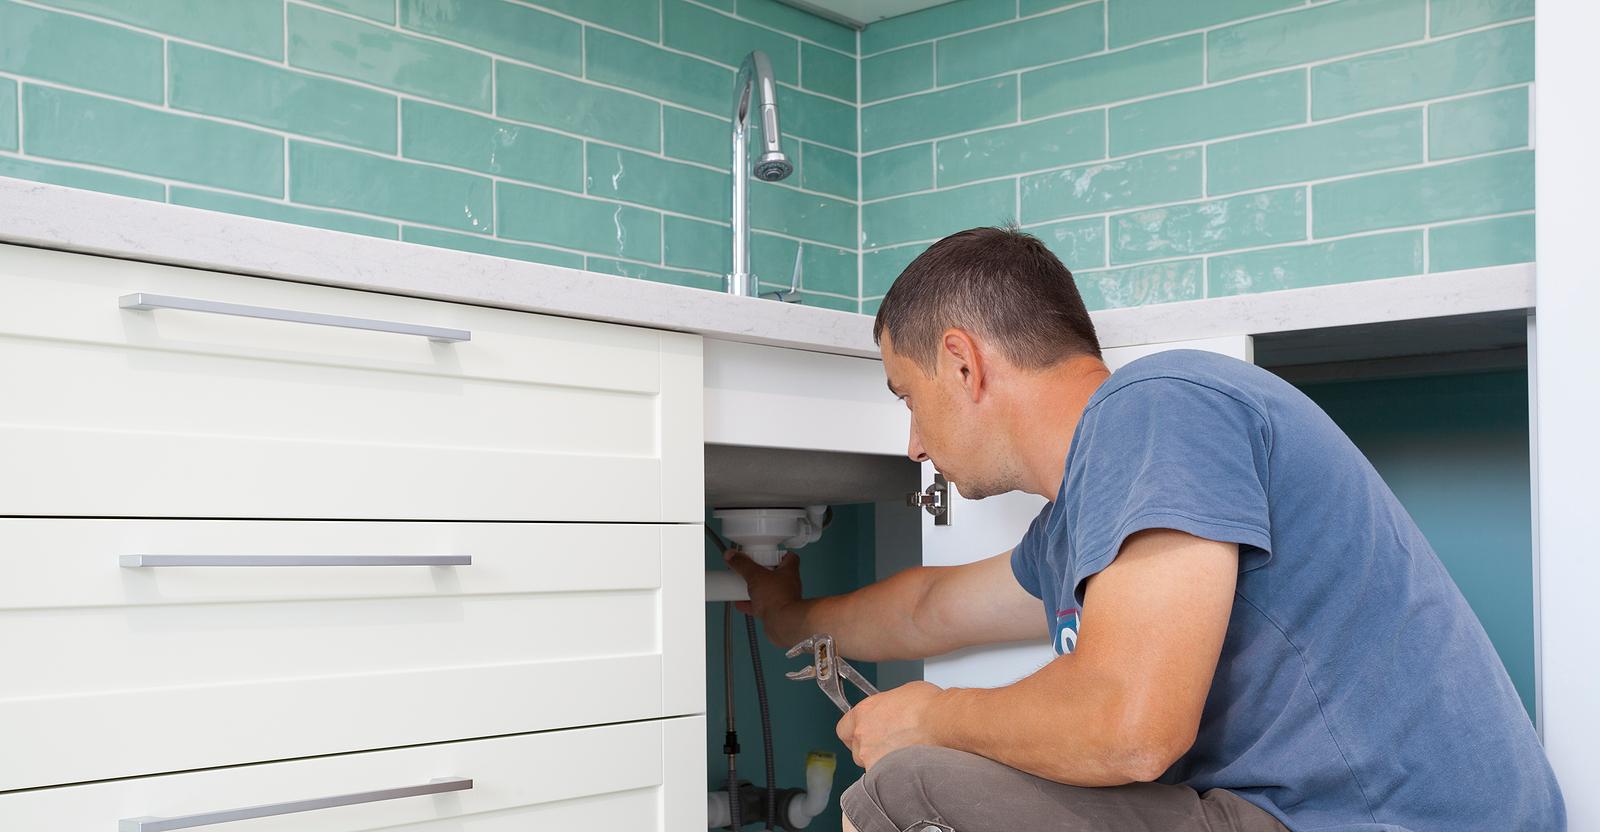 Plumber repairing the kitchen sink